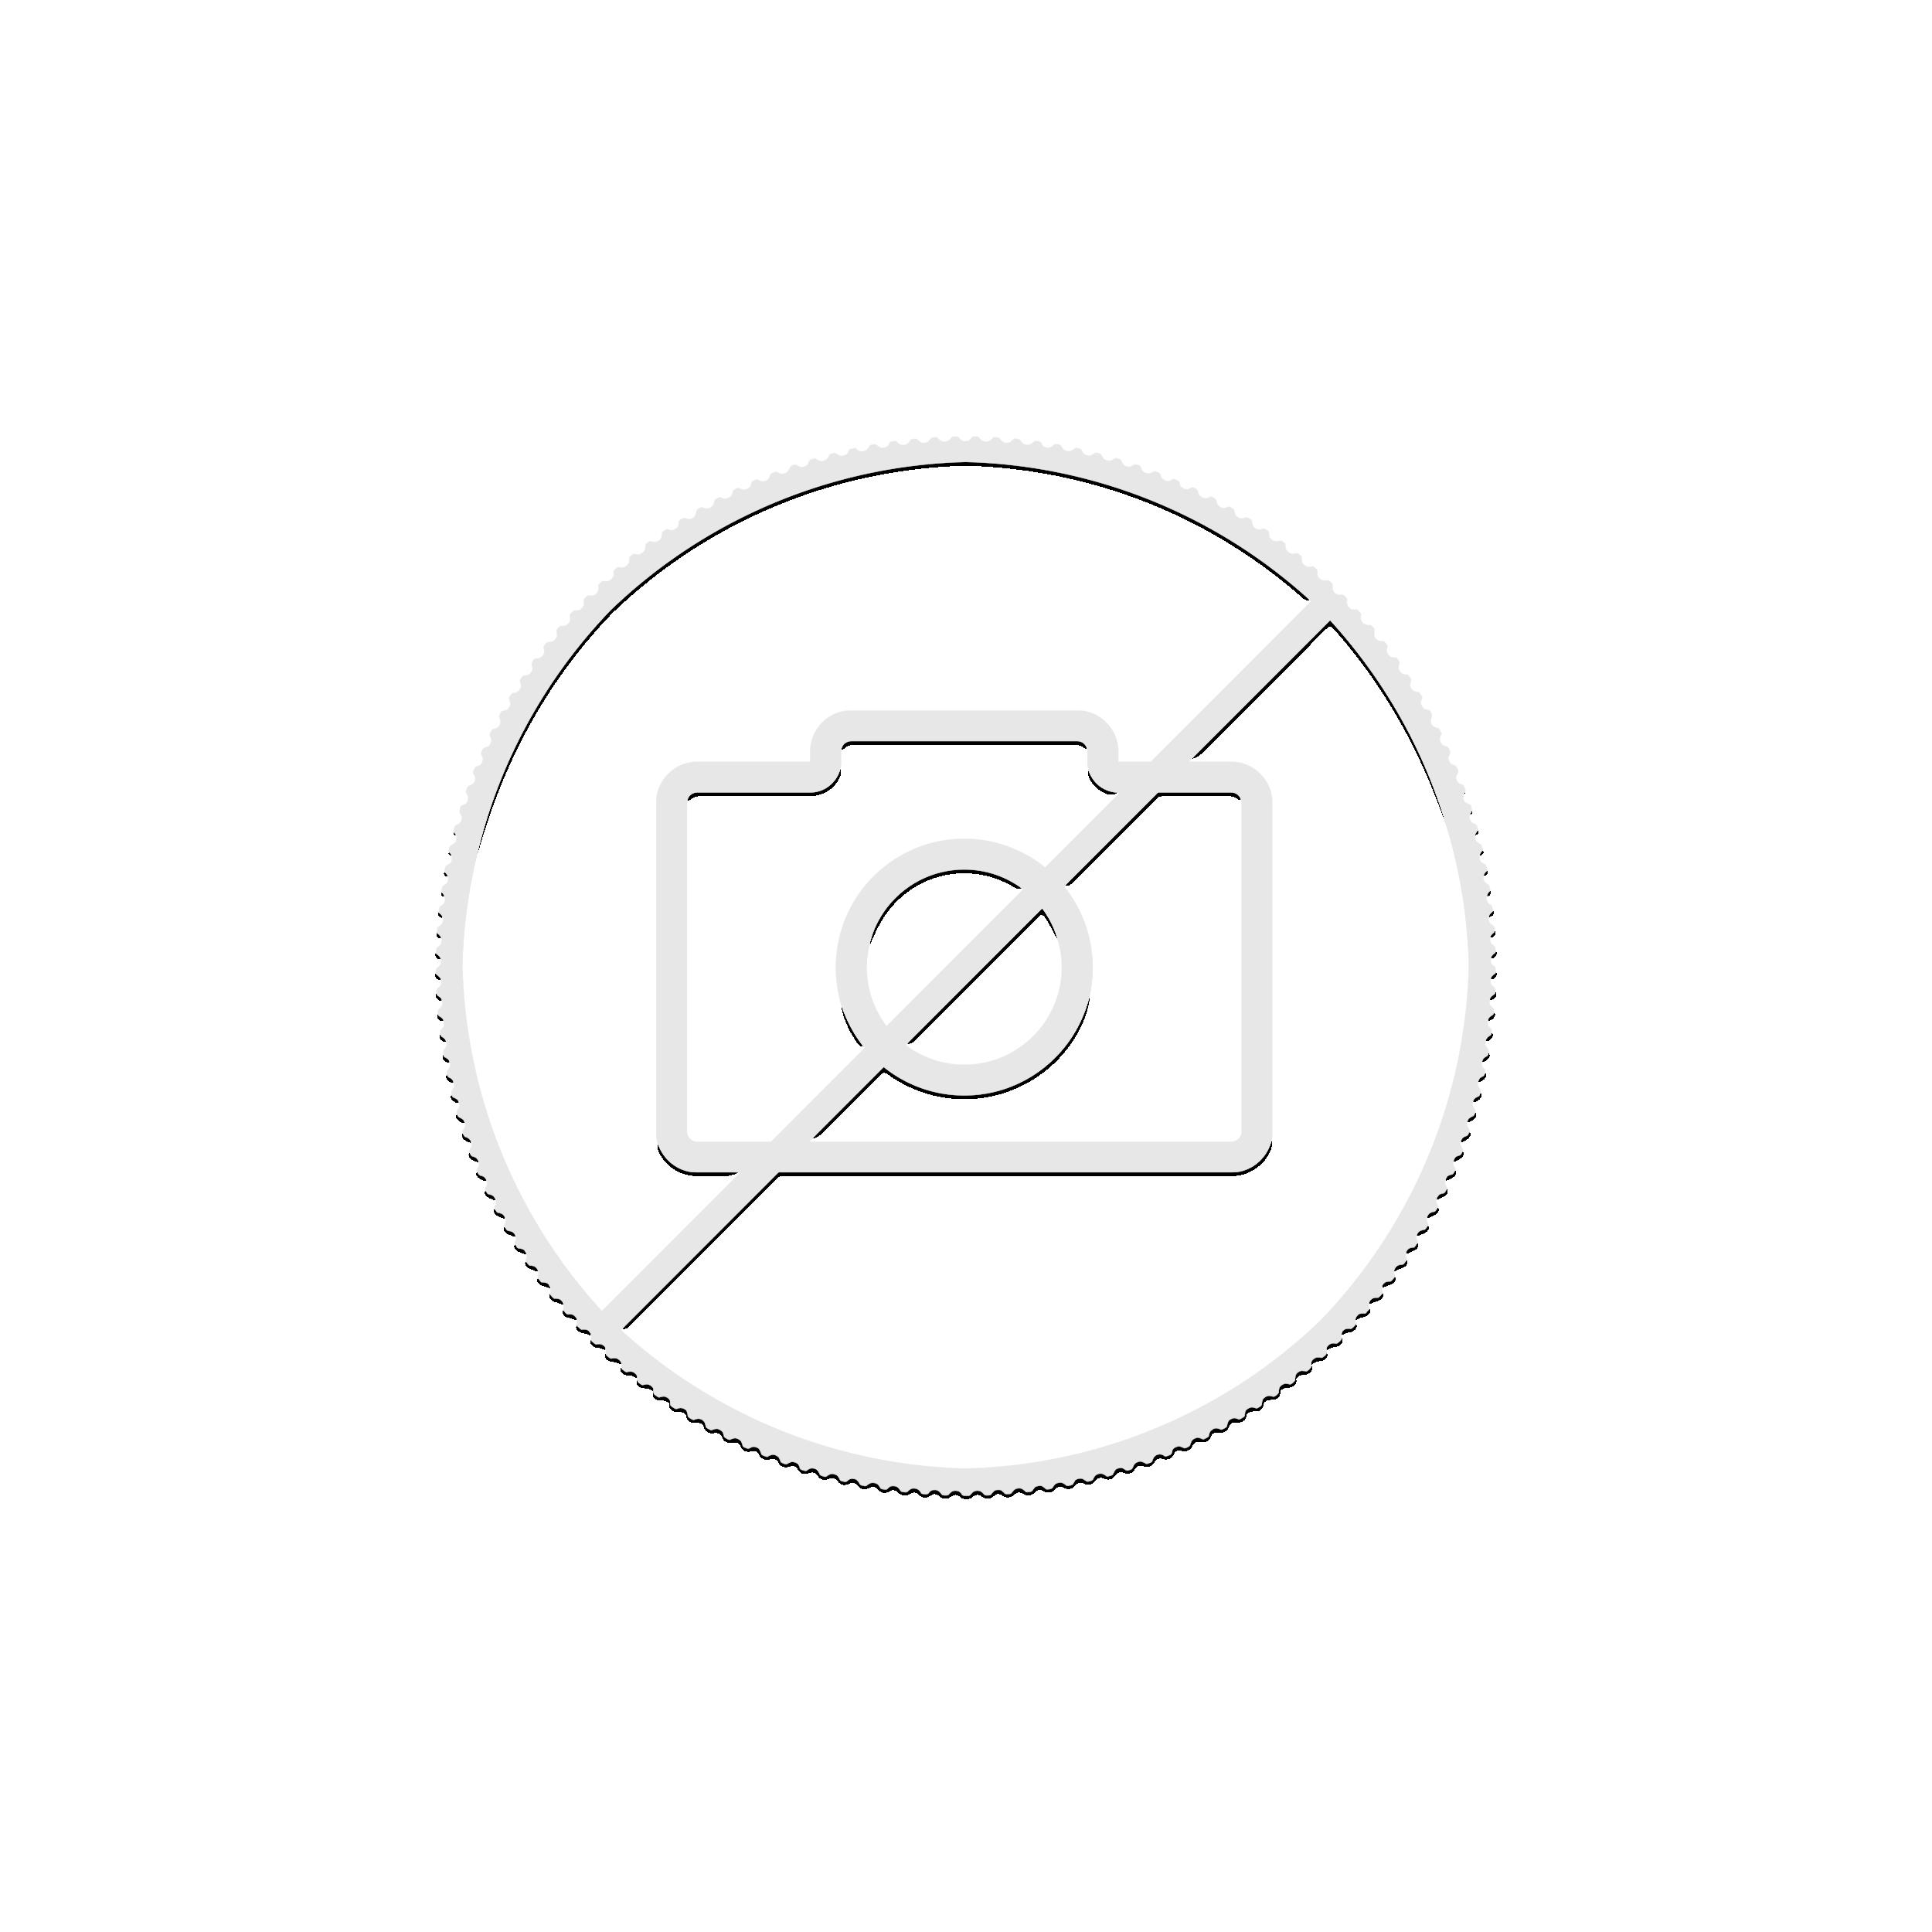 1 troy ounce zilveren munt Santa Clause gekleurd 2020